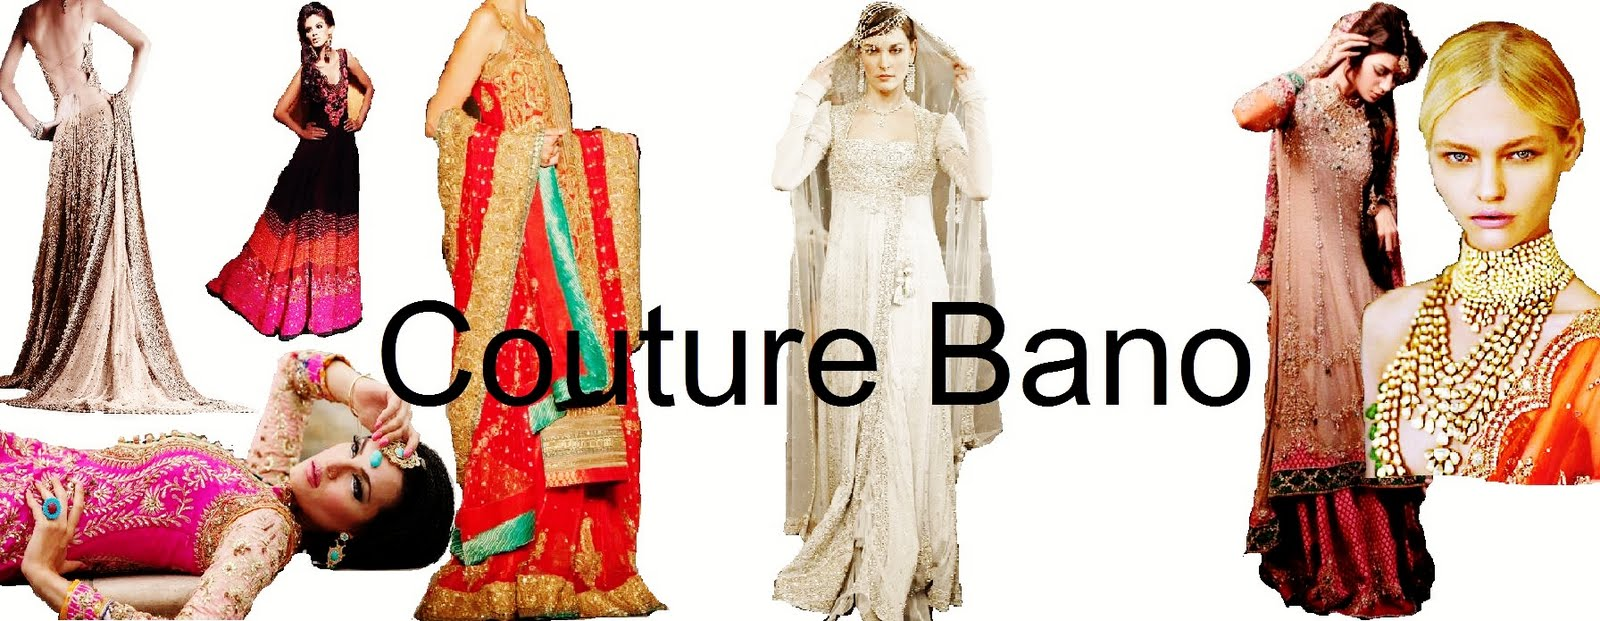 Couture Bano